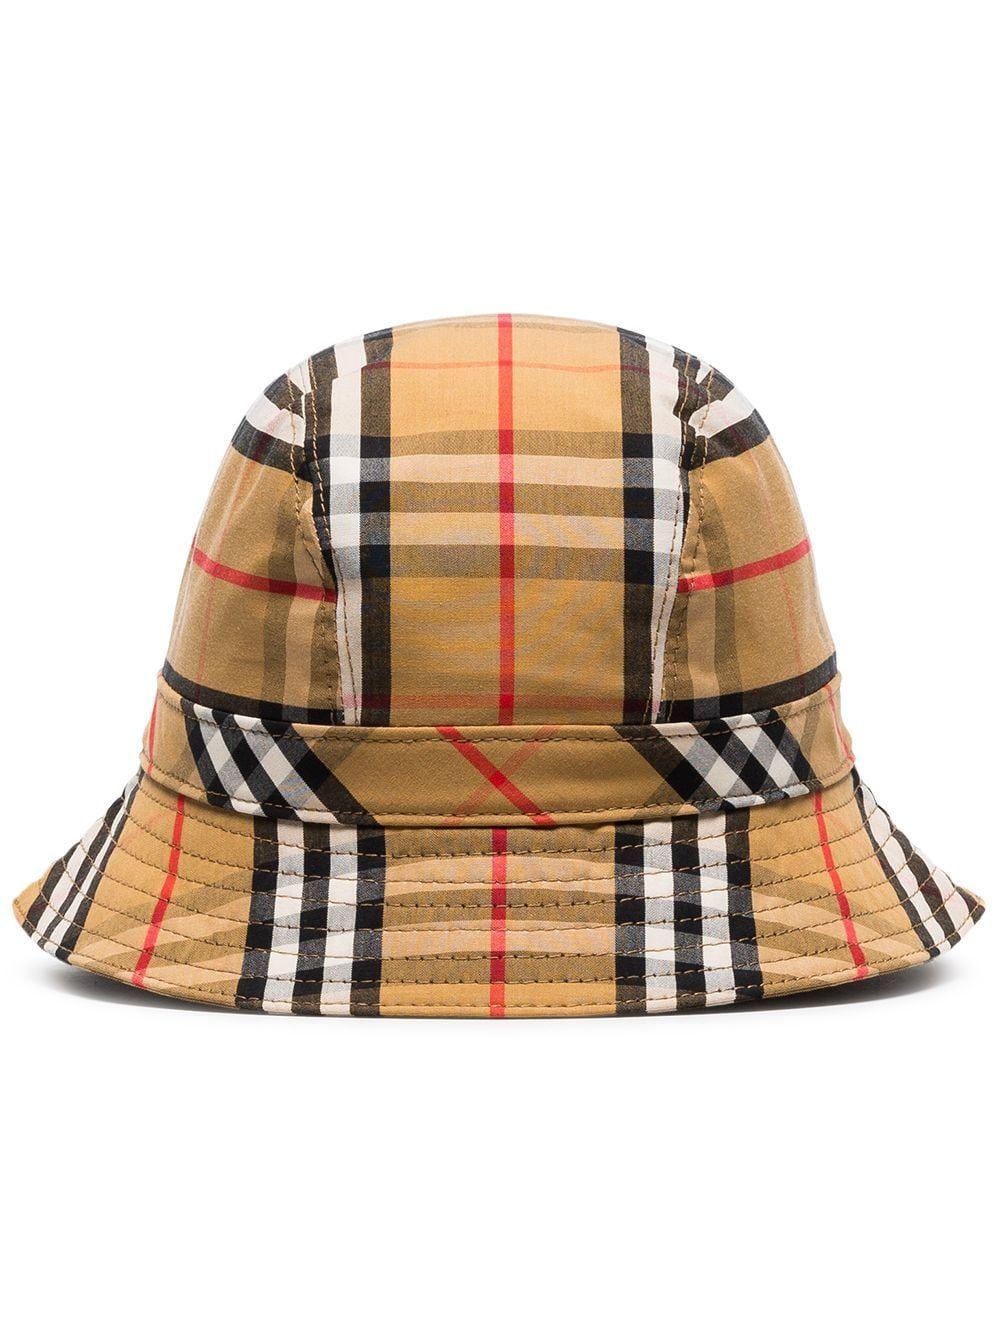 10724ecd9d1 BURBERRY BURBERRY MULTICOLOURED VINTAGE CHECK COTTON BUCKET HAT - BROWN.   burberry